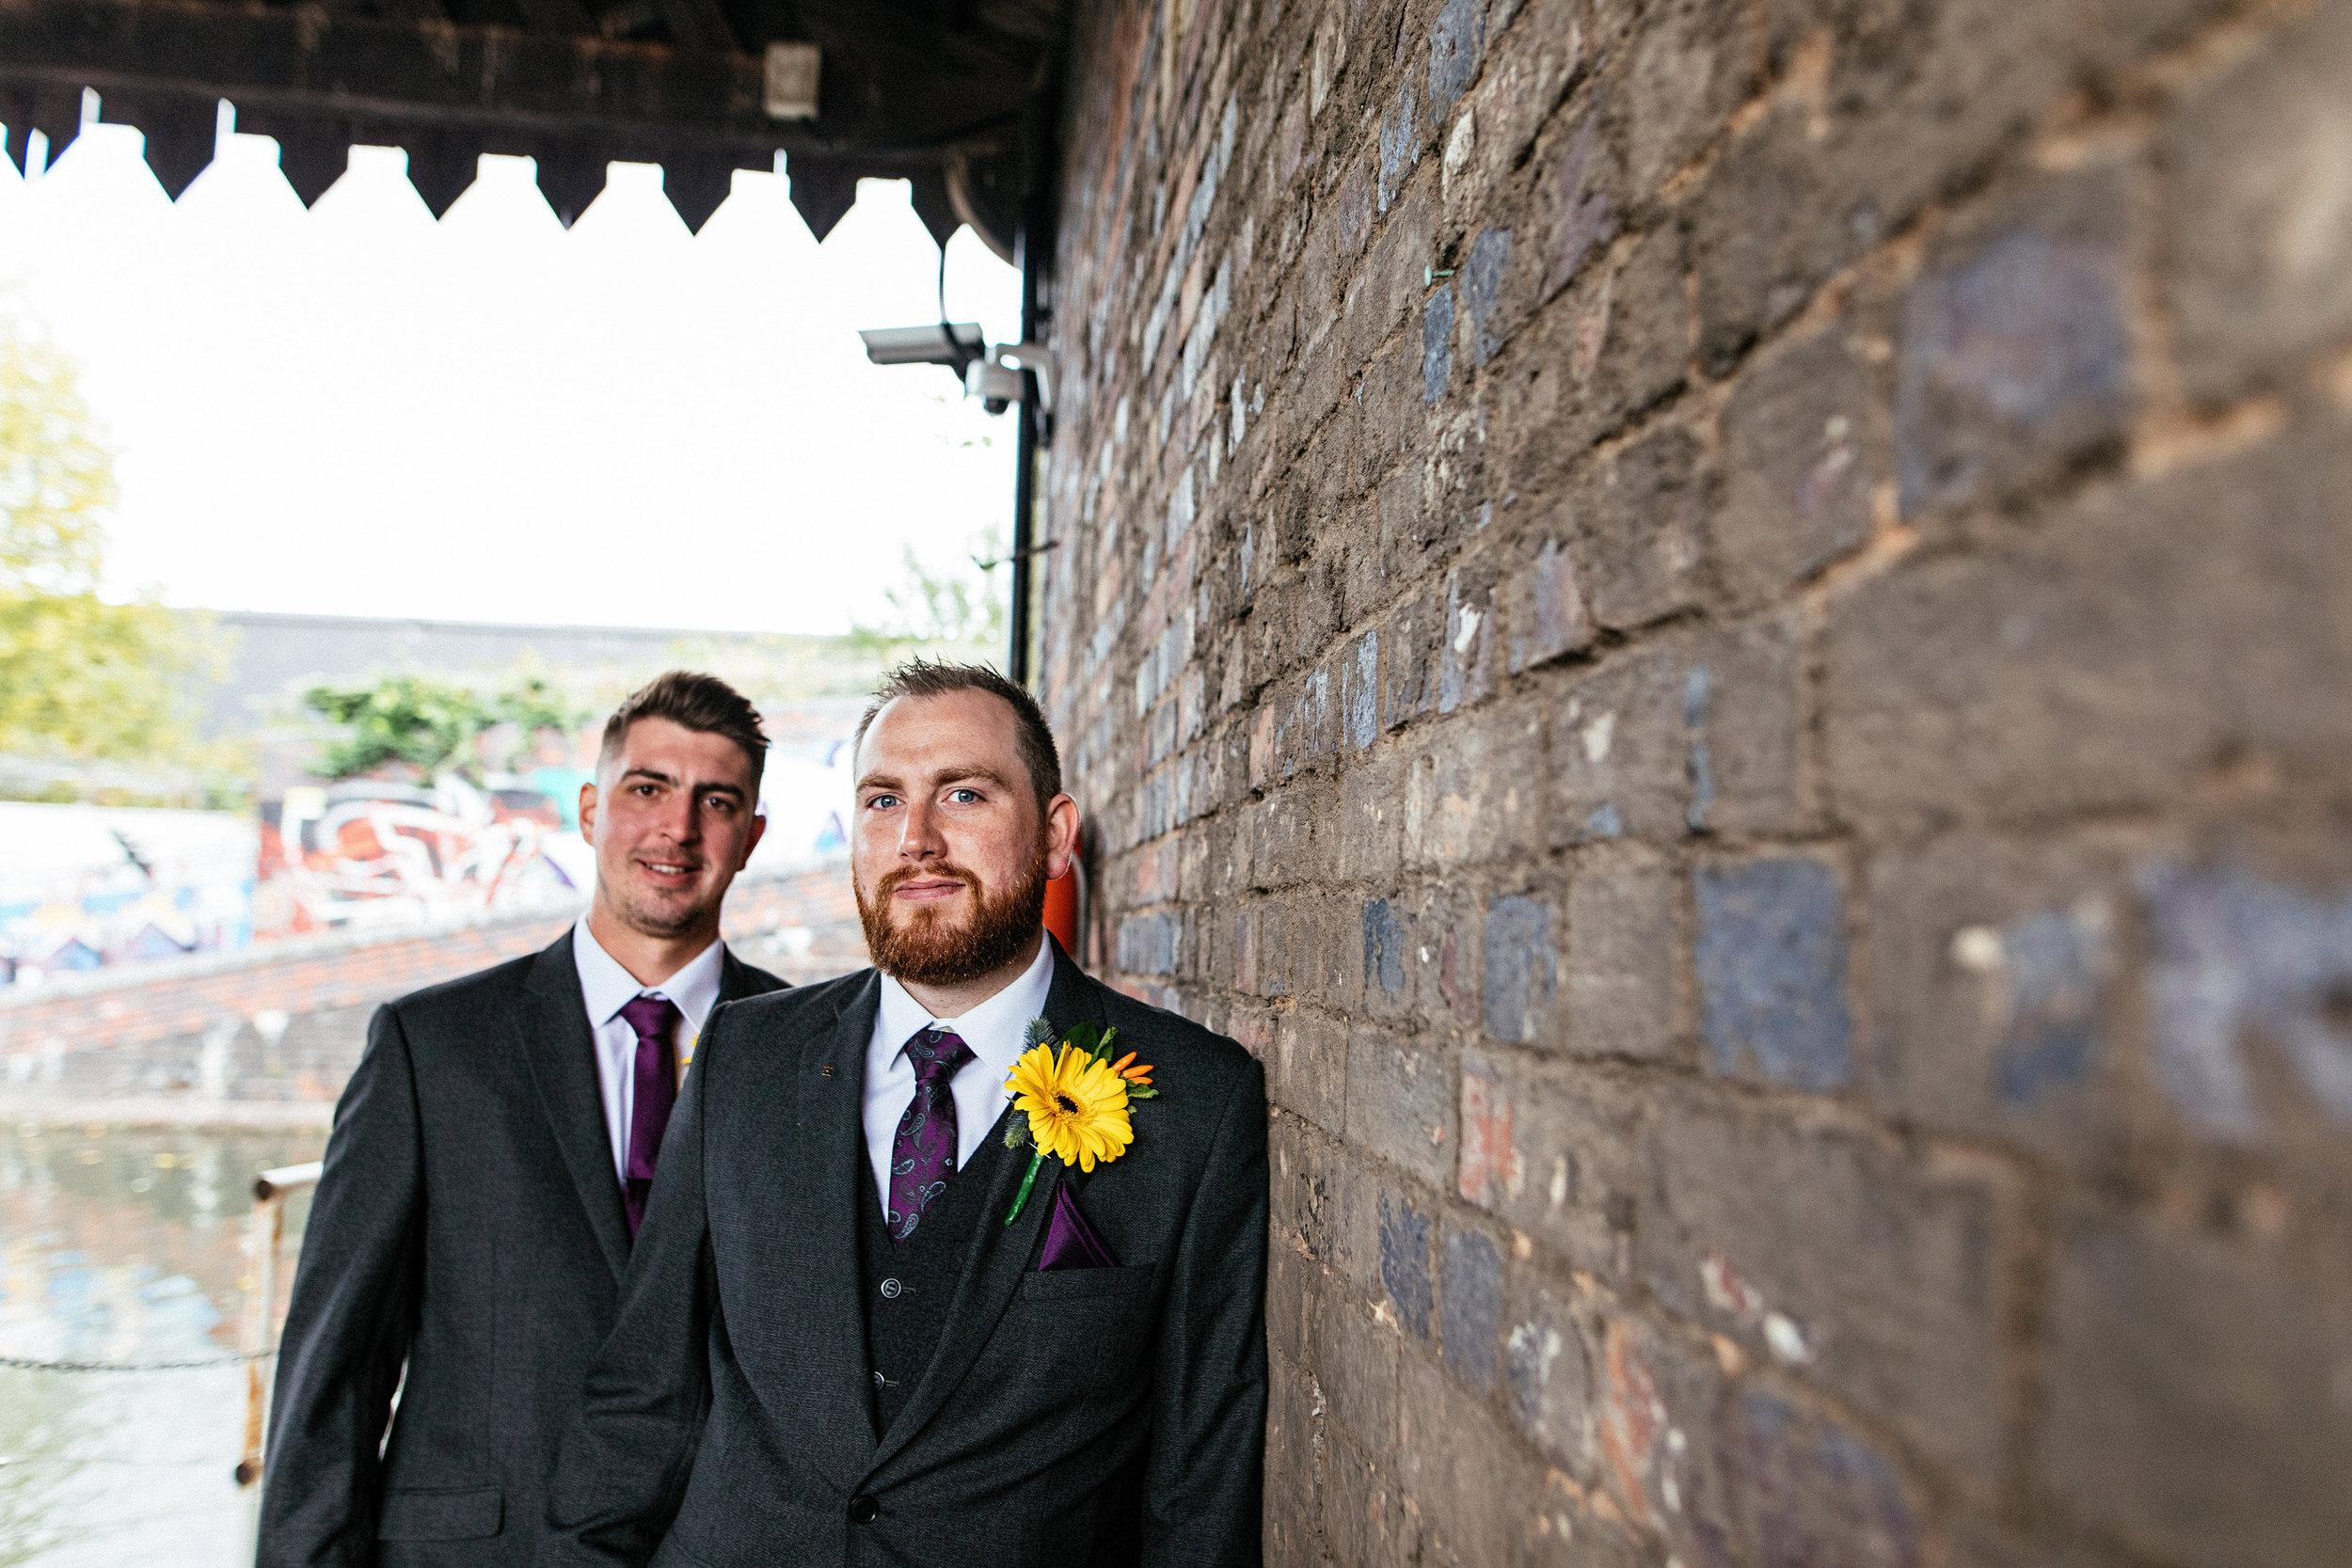 The-Bond-Company-Wedding-Photography-19-1.jpg